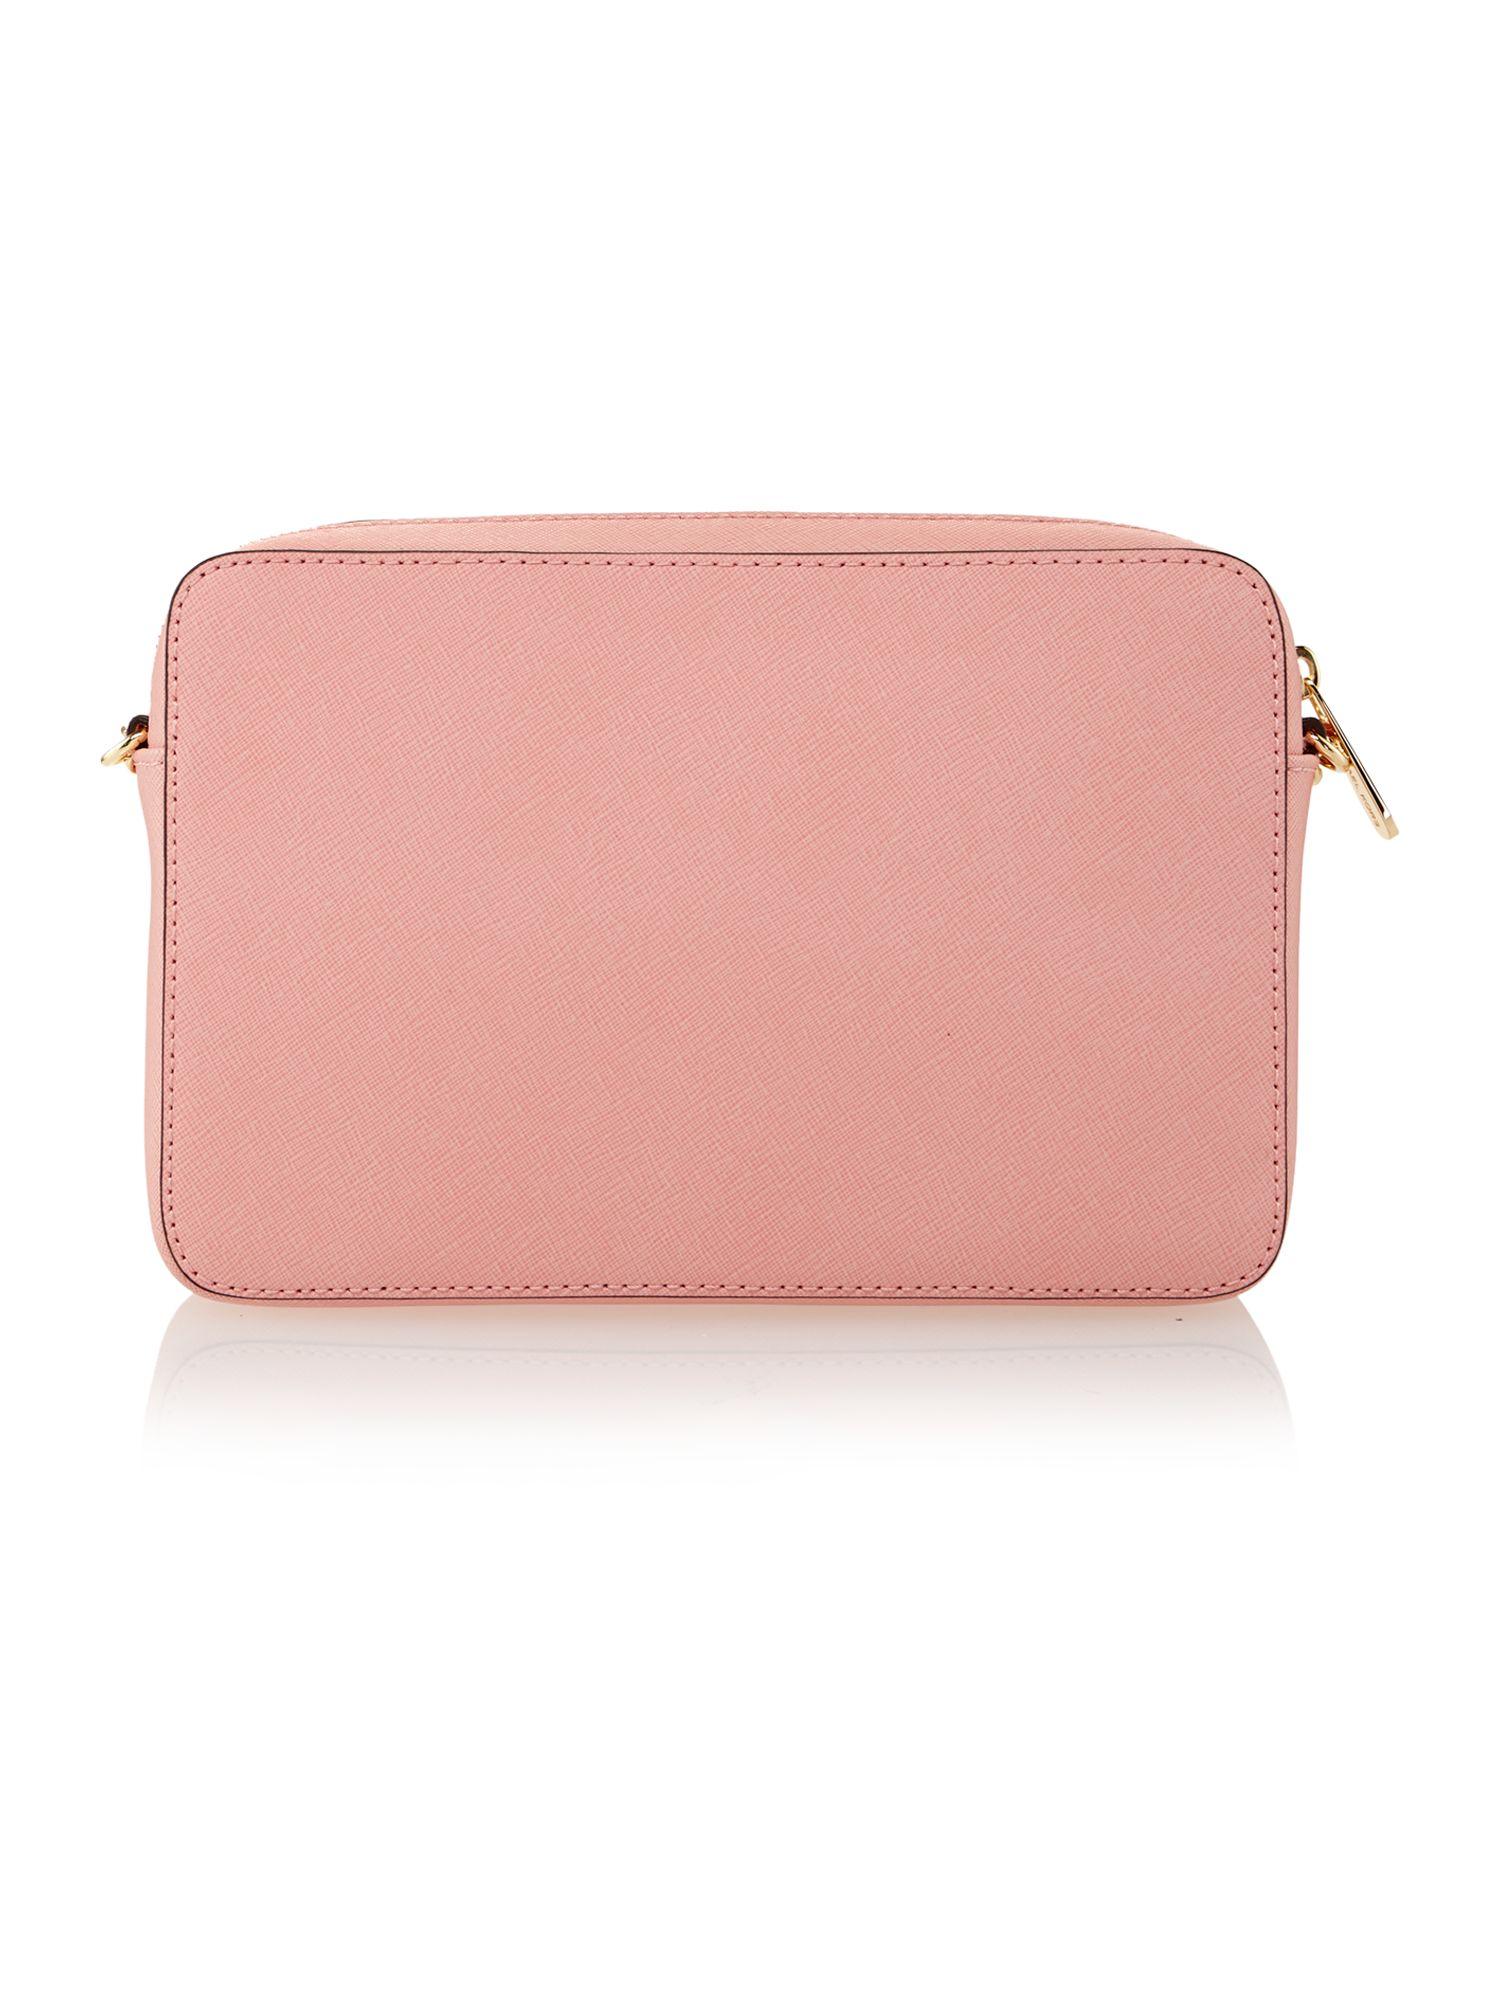 Michael Kors Jetset Travel Pale Pink Cross Body Bag